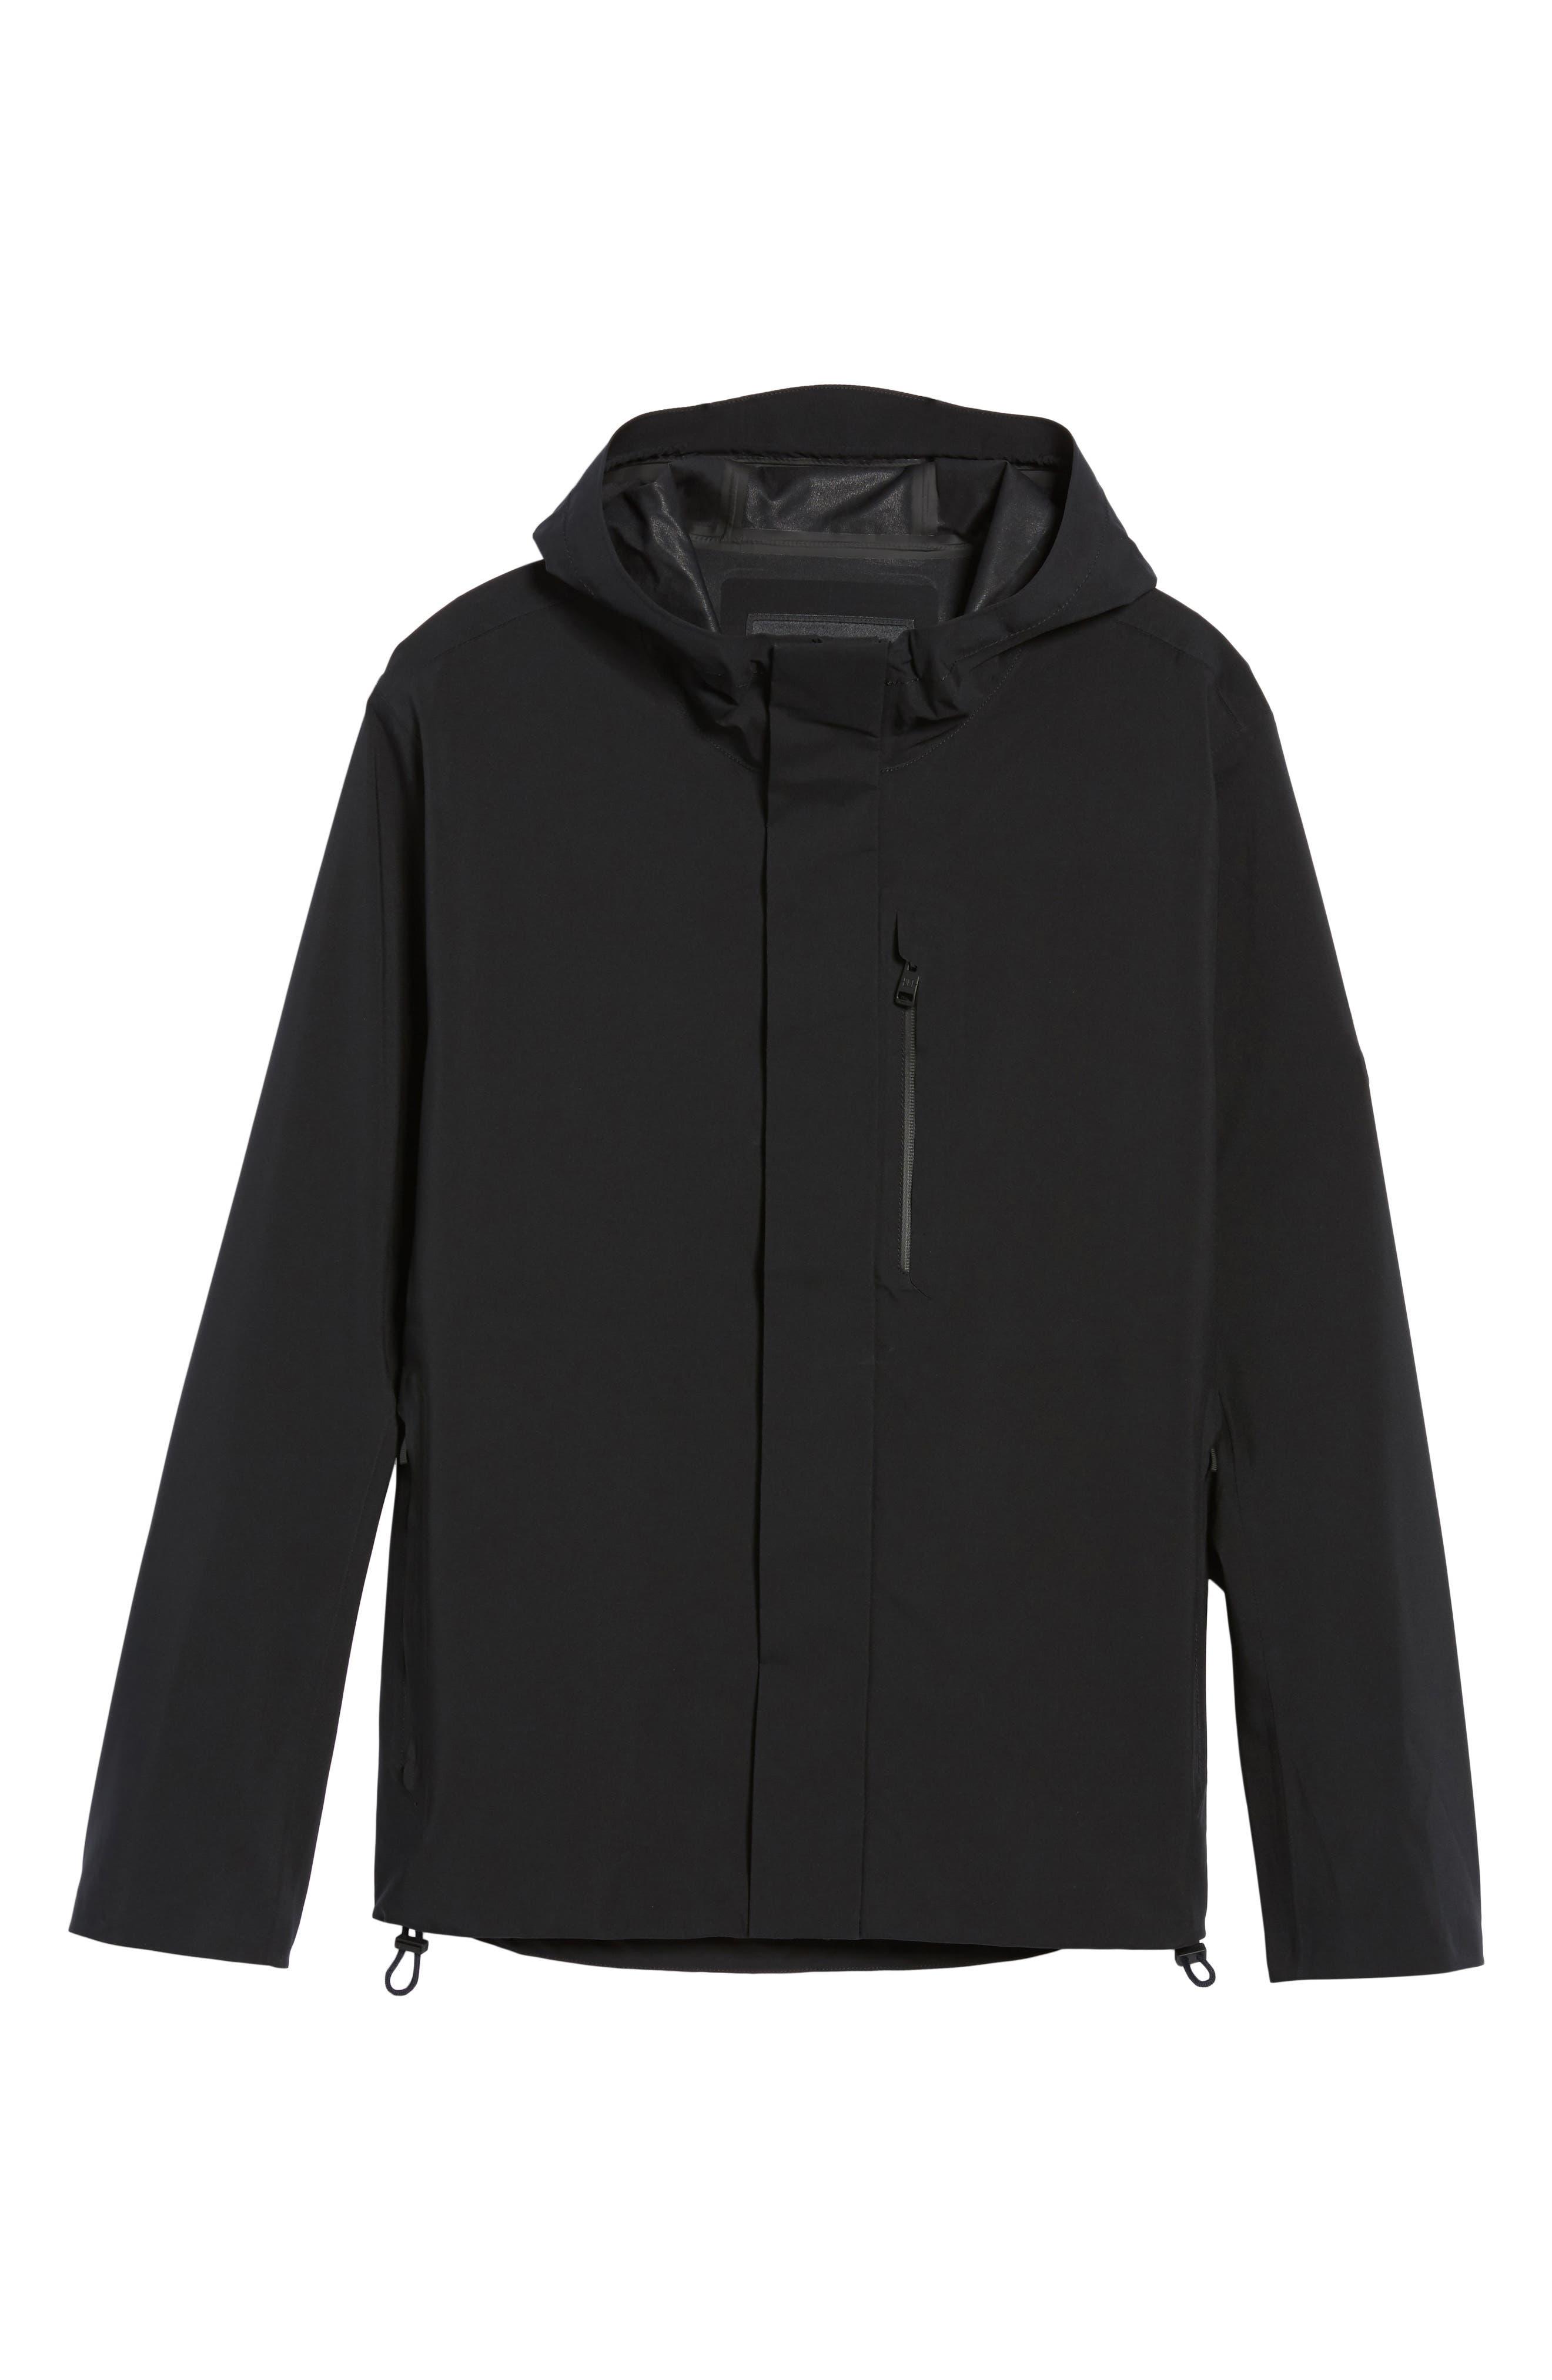 Marc New York Stratus Waterproof Hooded Rain Jacket,                             Alternate thumbnail 5, color,                             001